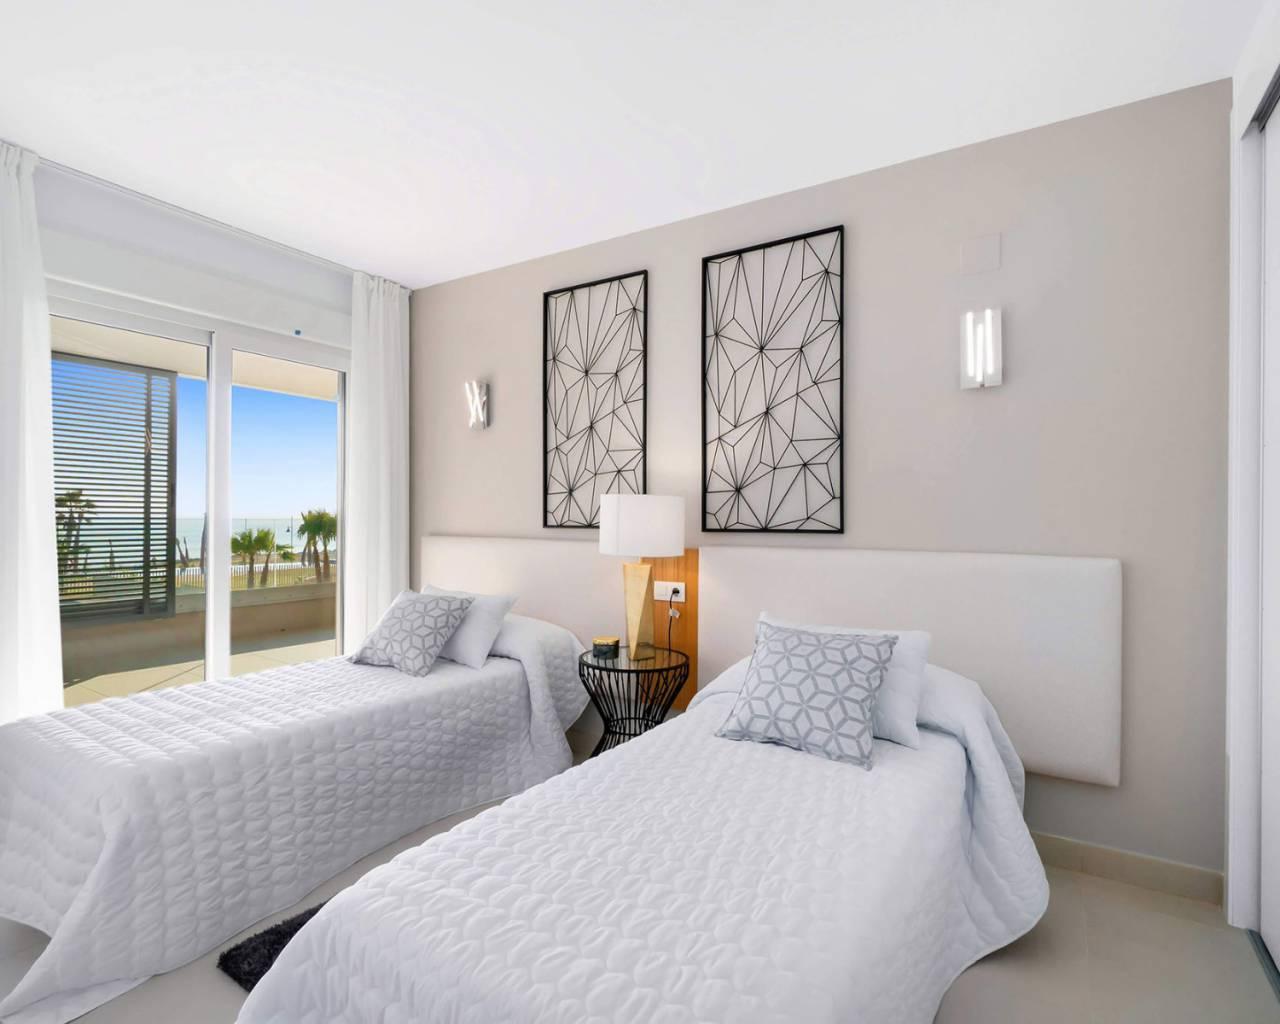 nieuwbouw-appartement-torrevieja-punta-prima_2900_xl